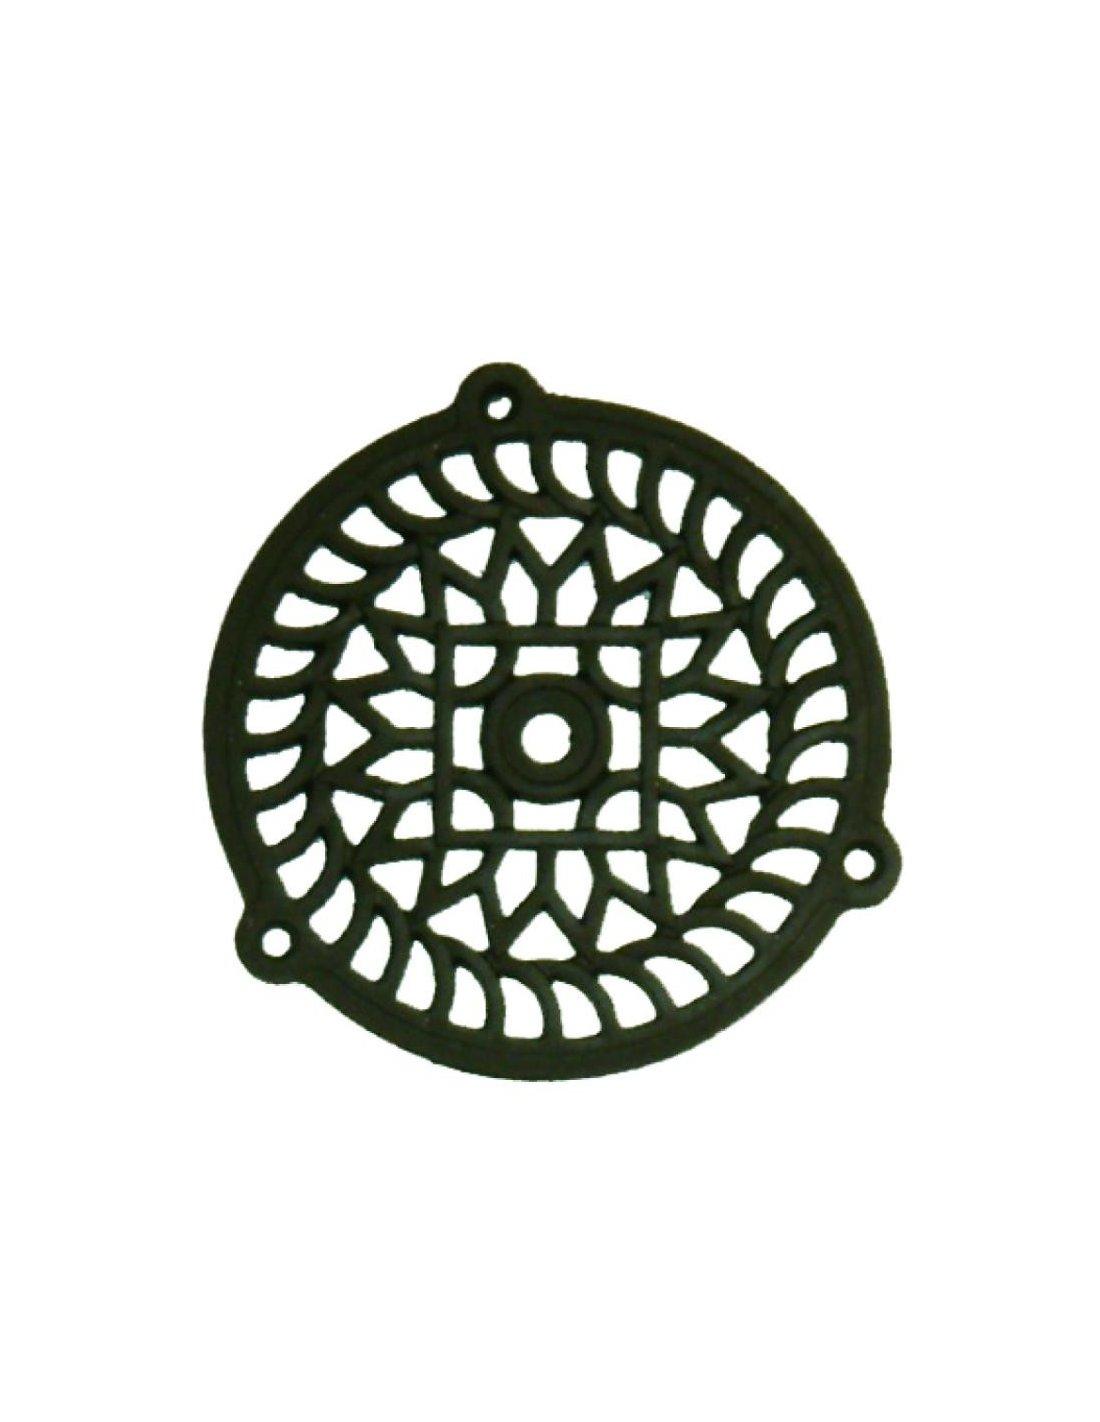 Rejilla hierro fundido for Chimenea hierro fundido